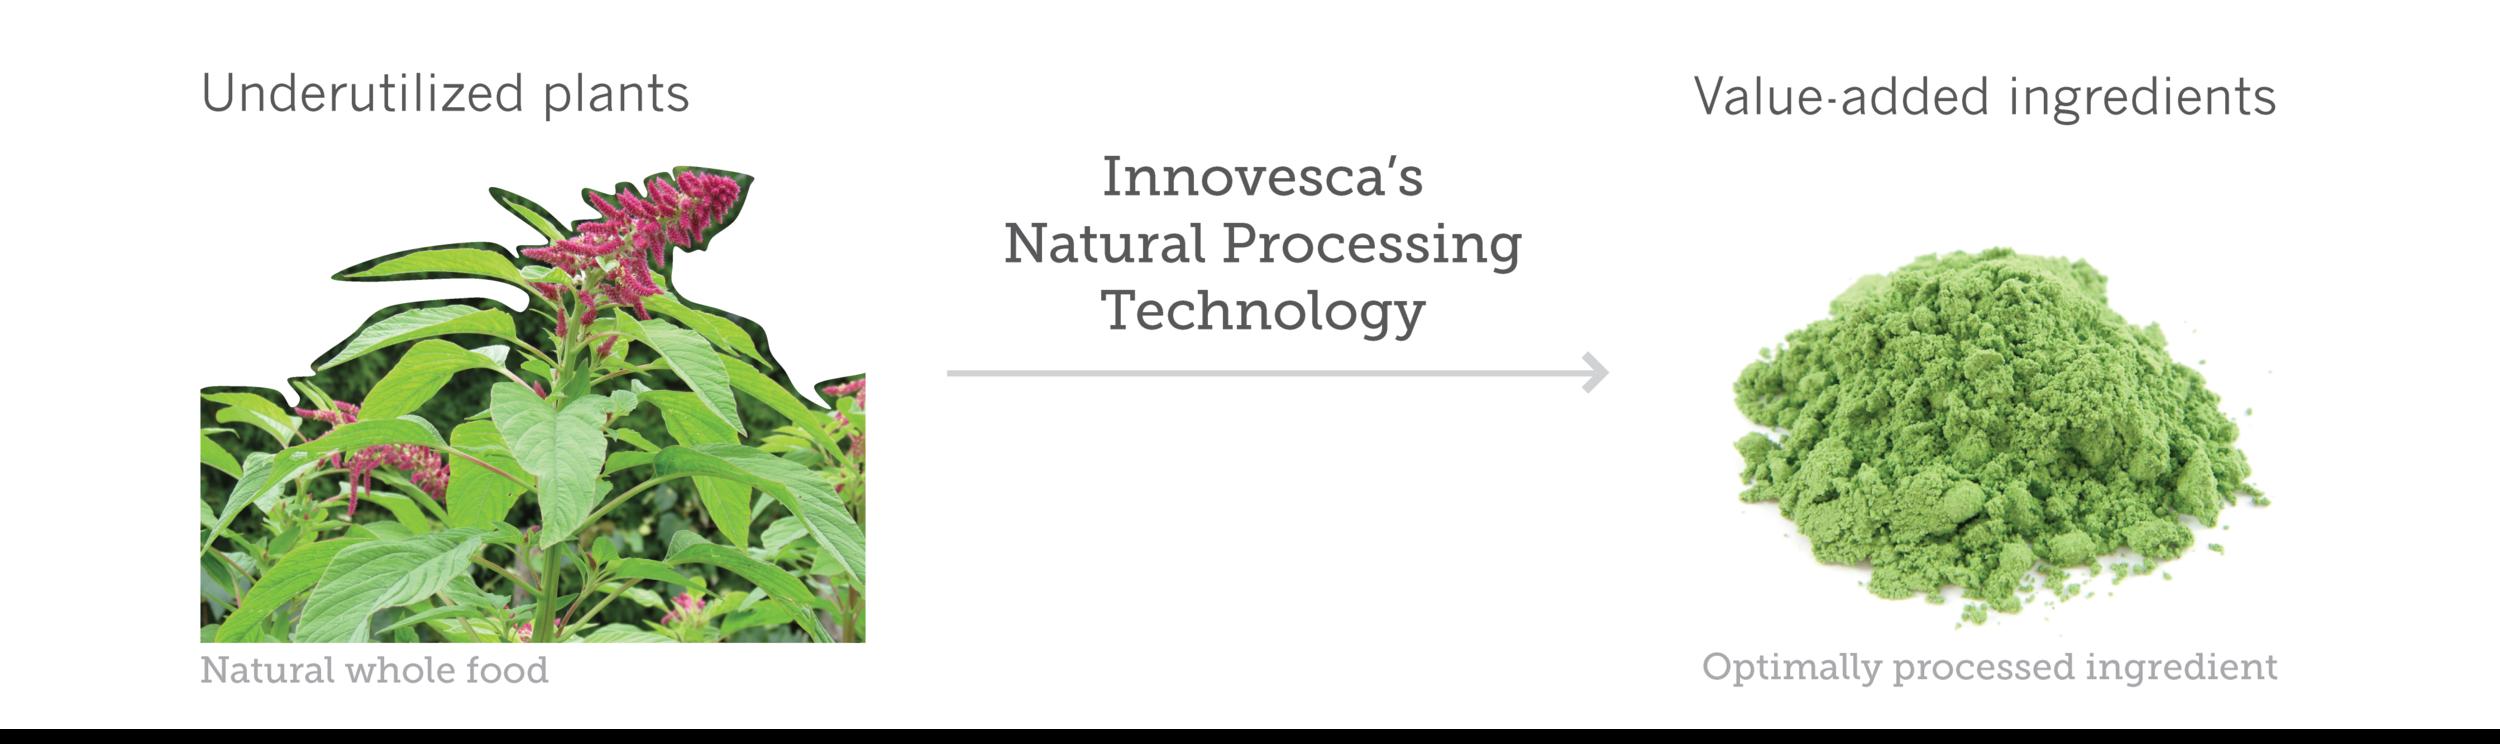 Innovesca_Technology